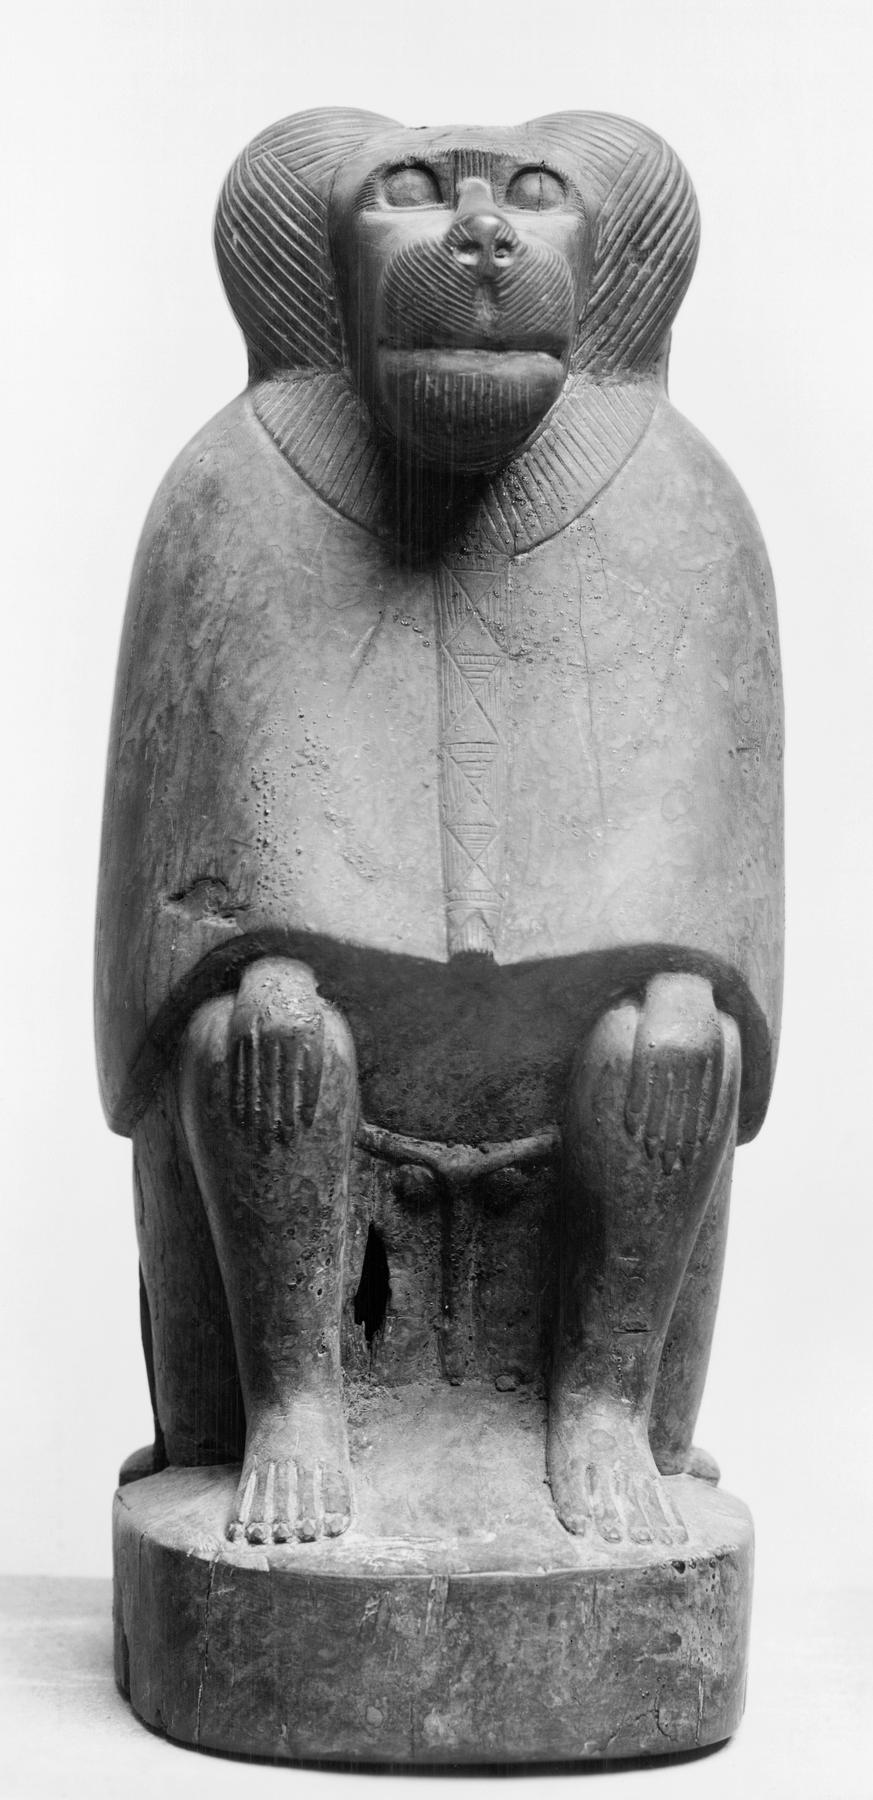 http://upload.wikimedia.org/wikipedia/commons/9/95/Egyptian_-_Baboon_Mummy_Coffin_-_Walters_22245.jpg